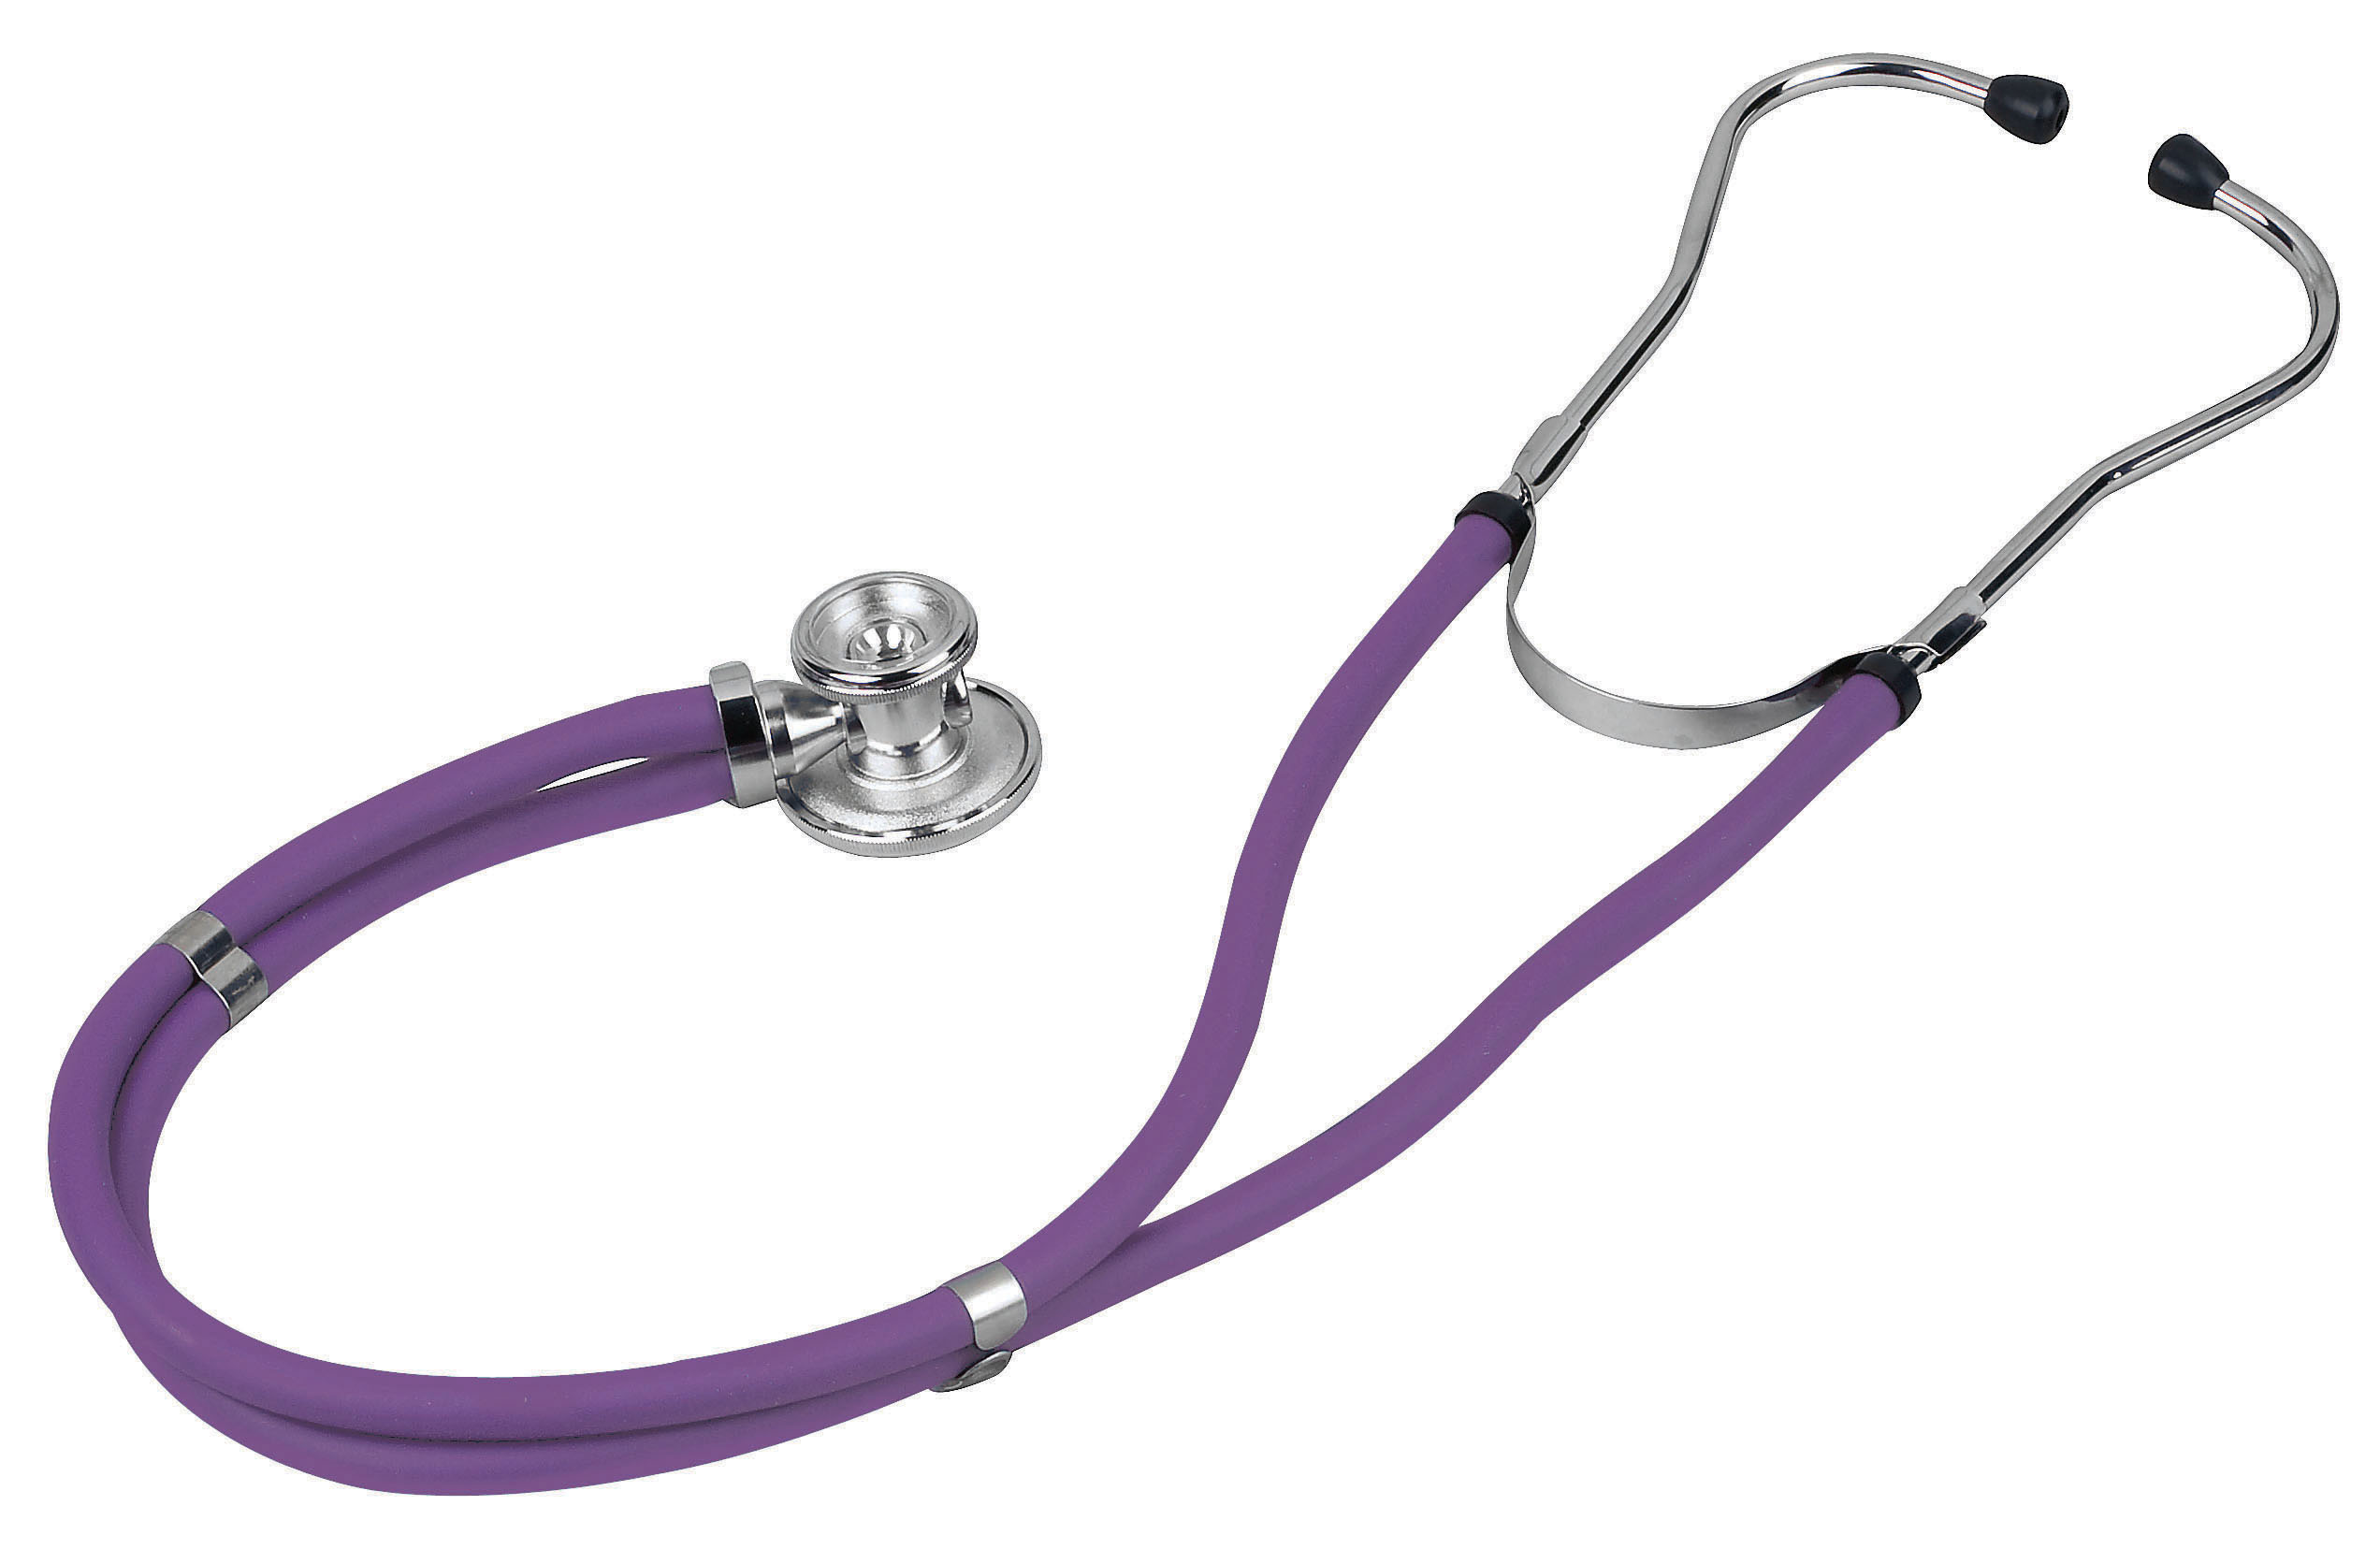 sterling-series-sprague-rappaport-type-stethoscope-purple-boxed-05-11011-veridian-3.jpg